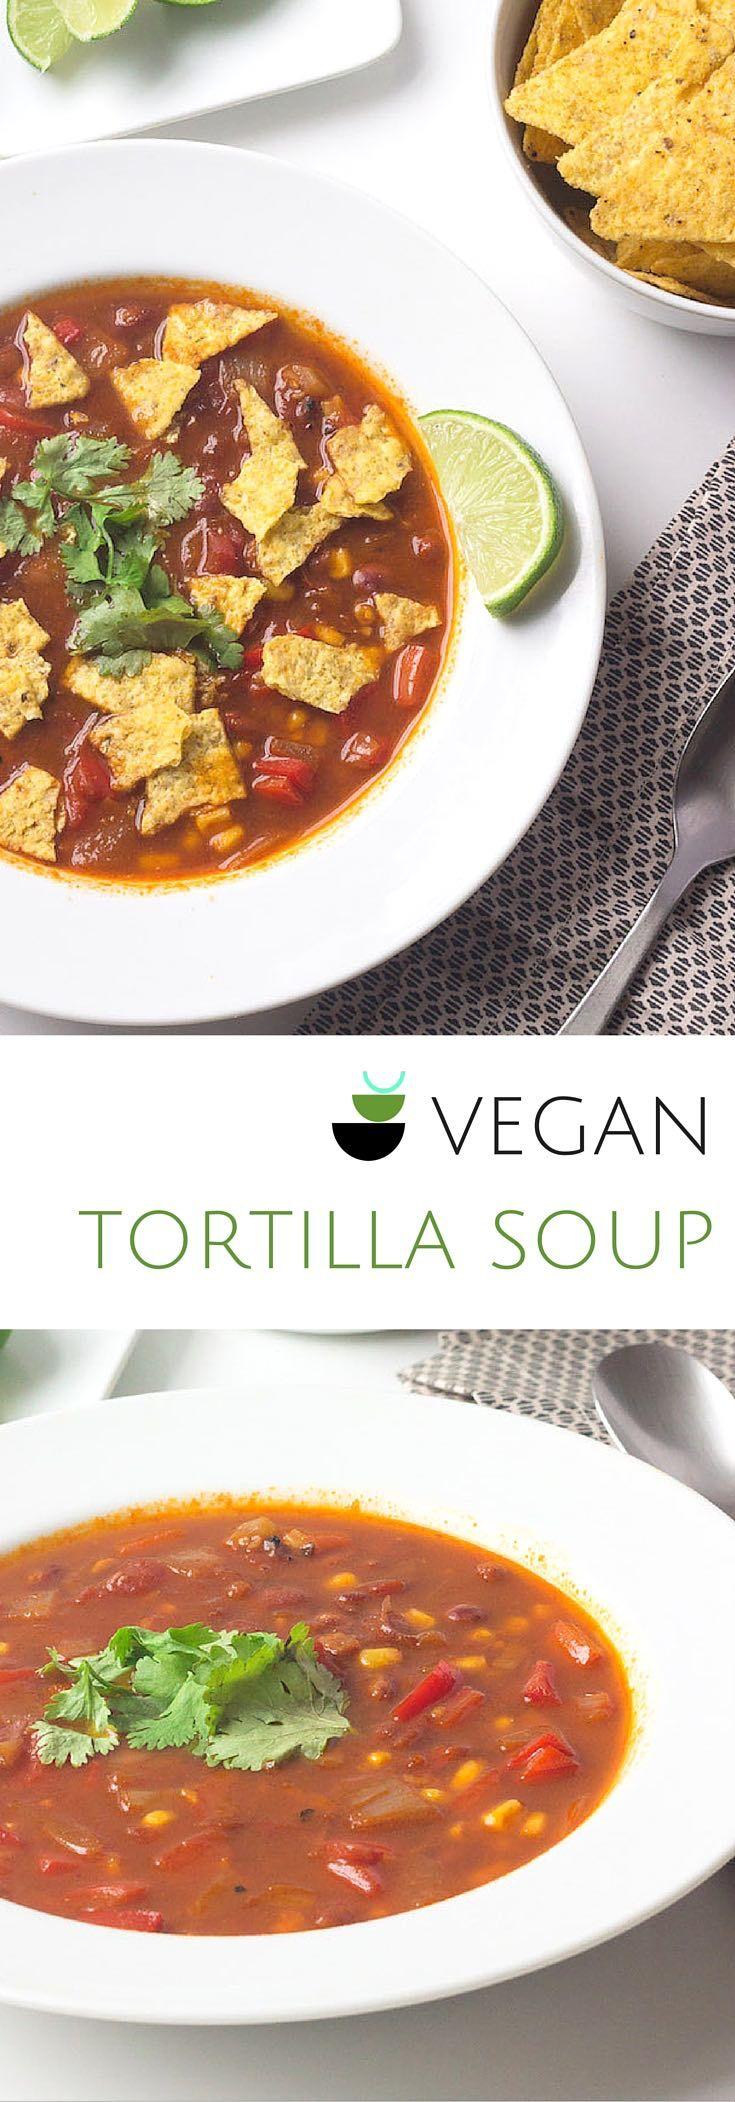 Vegan Tortilla Soup - Prepgreen